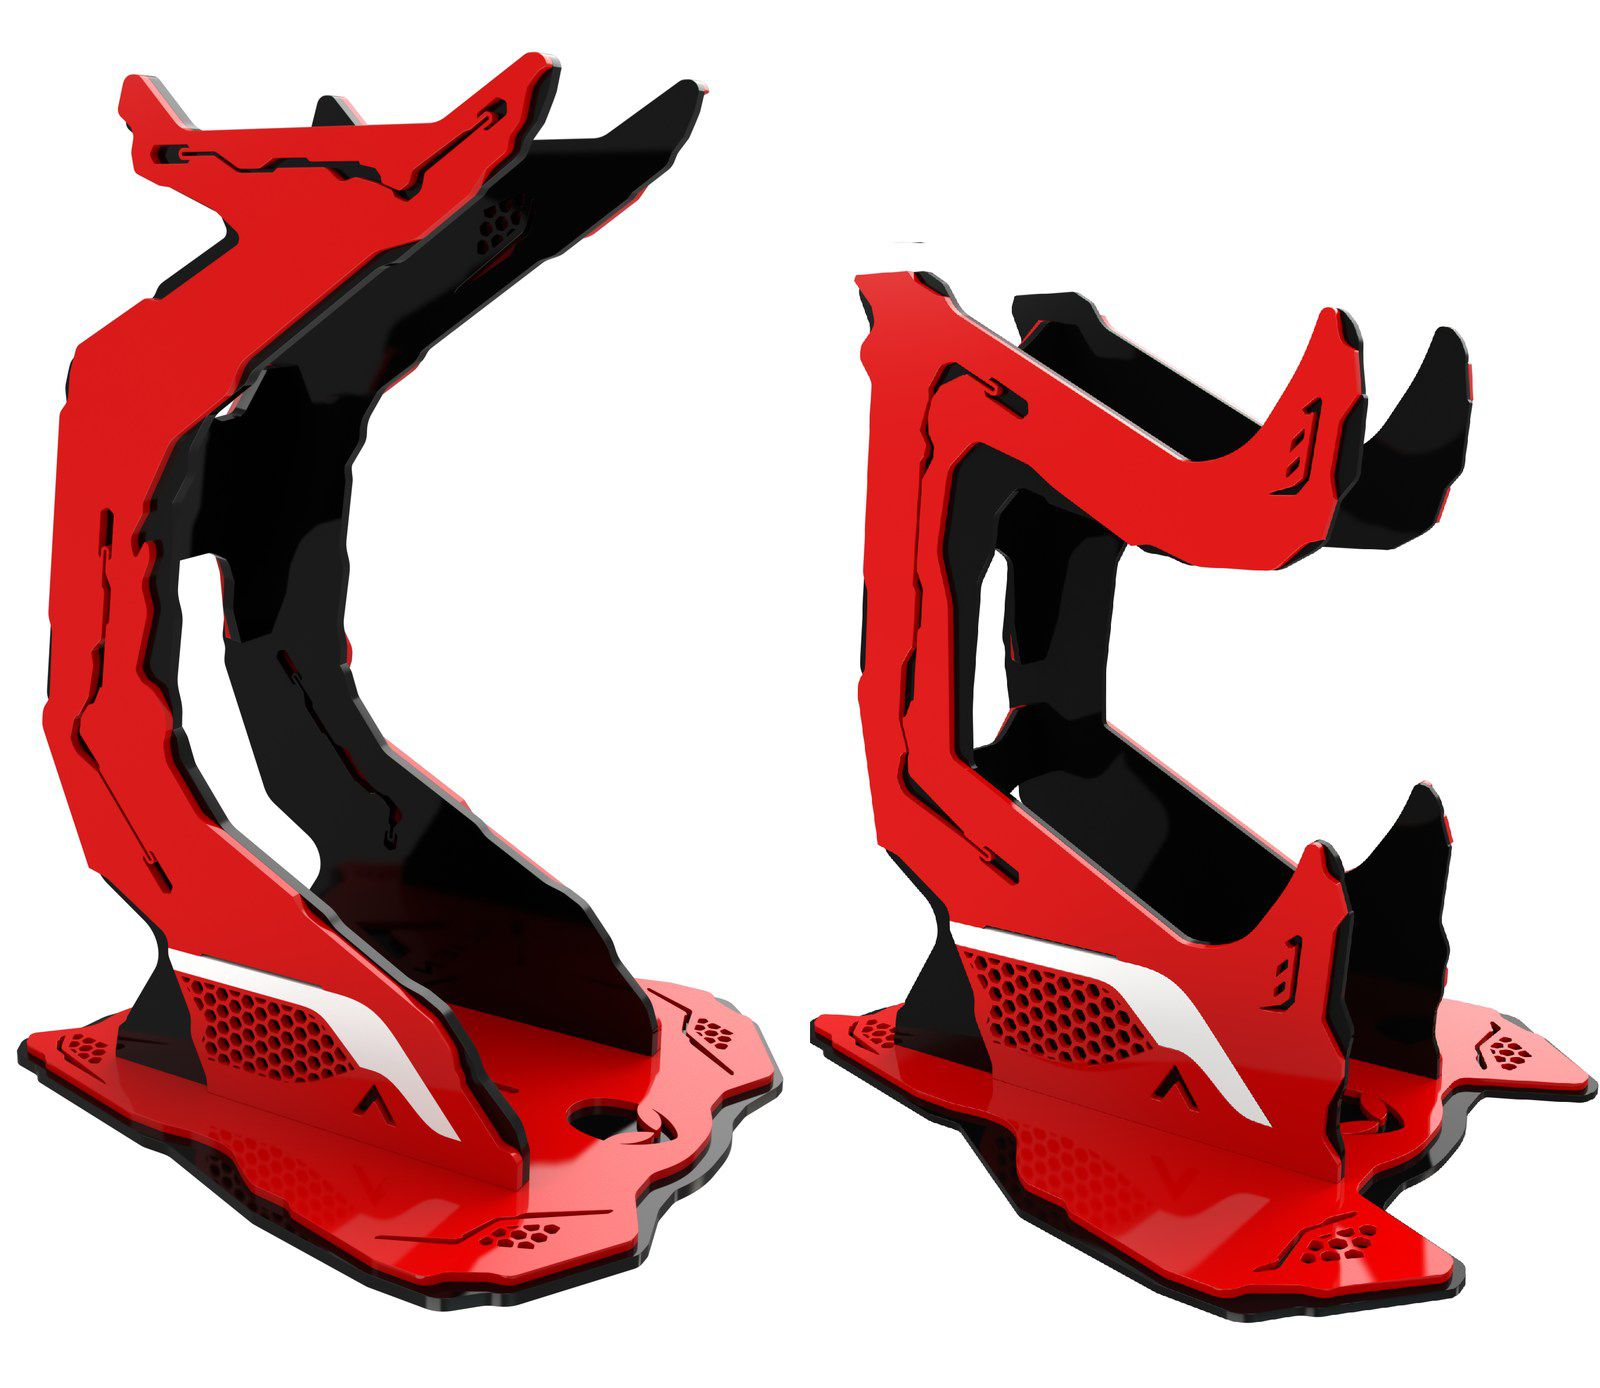 Combo Suporte Headset Alien Pro E Suporte Controle Rise Mode Alien 10% Desconto  - Loja Rise Mode